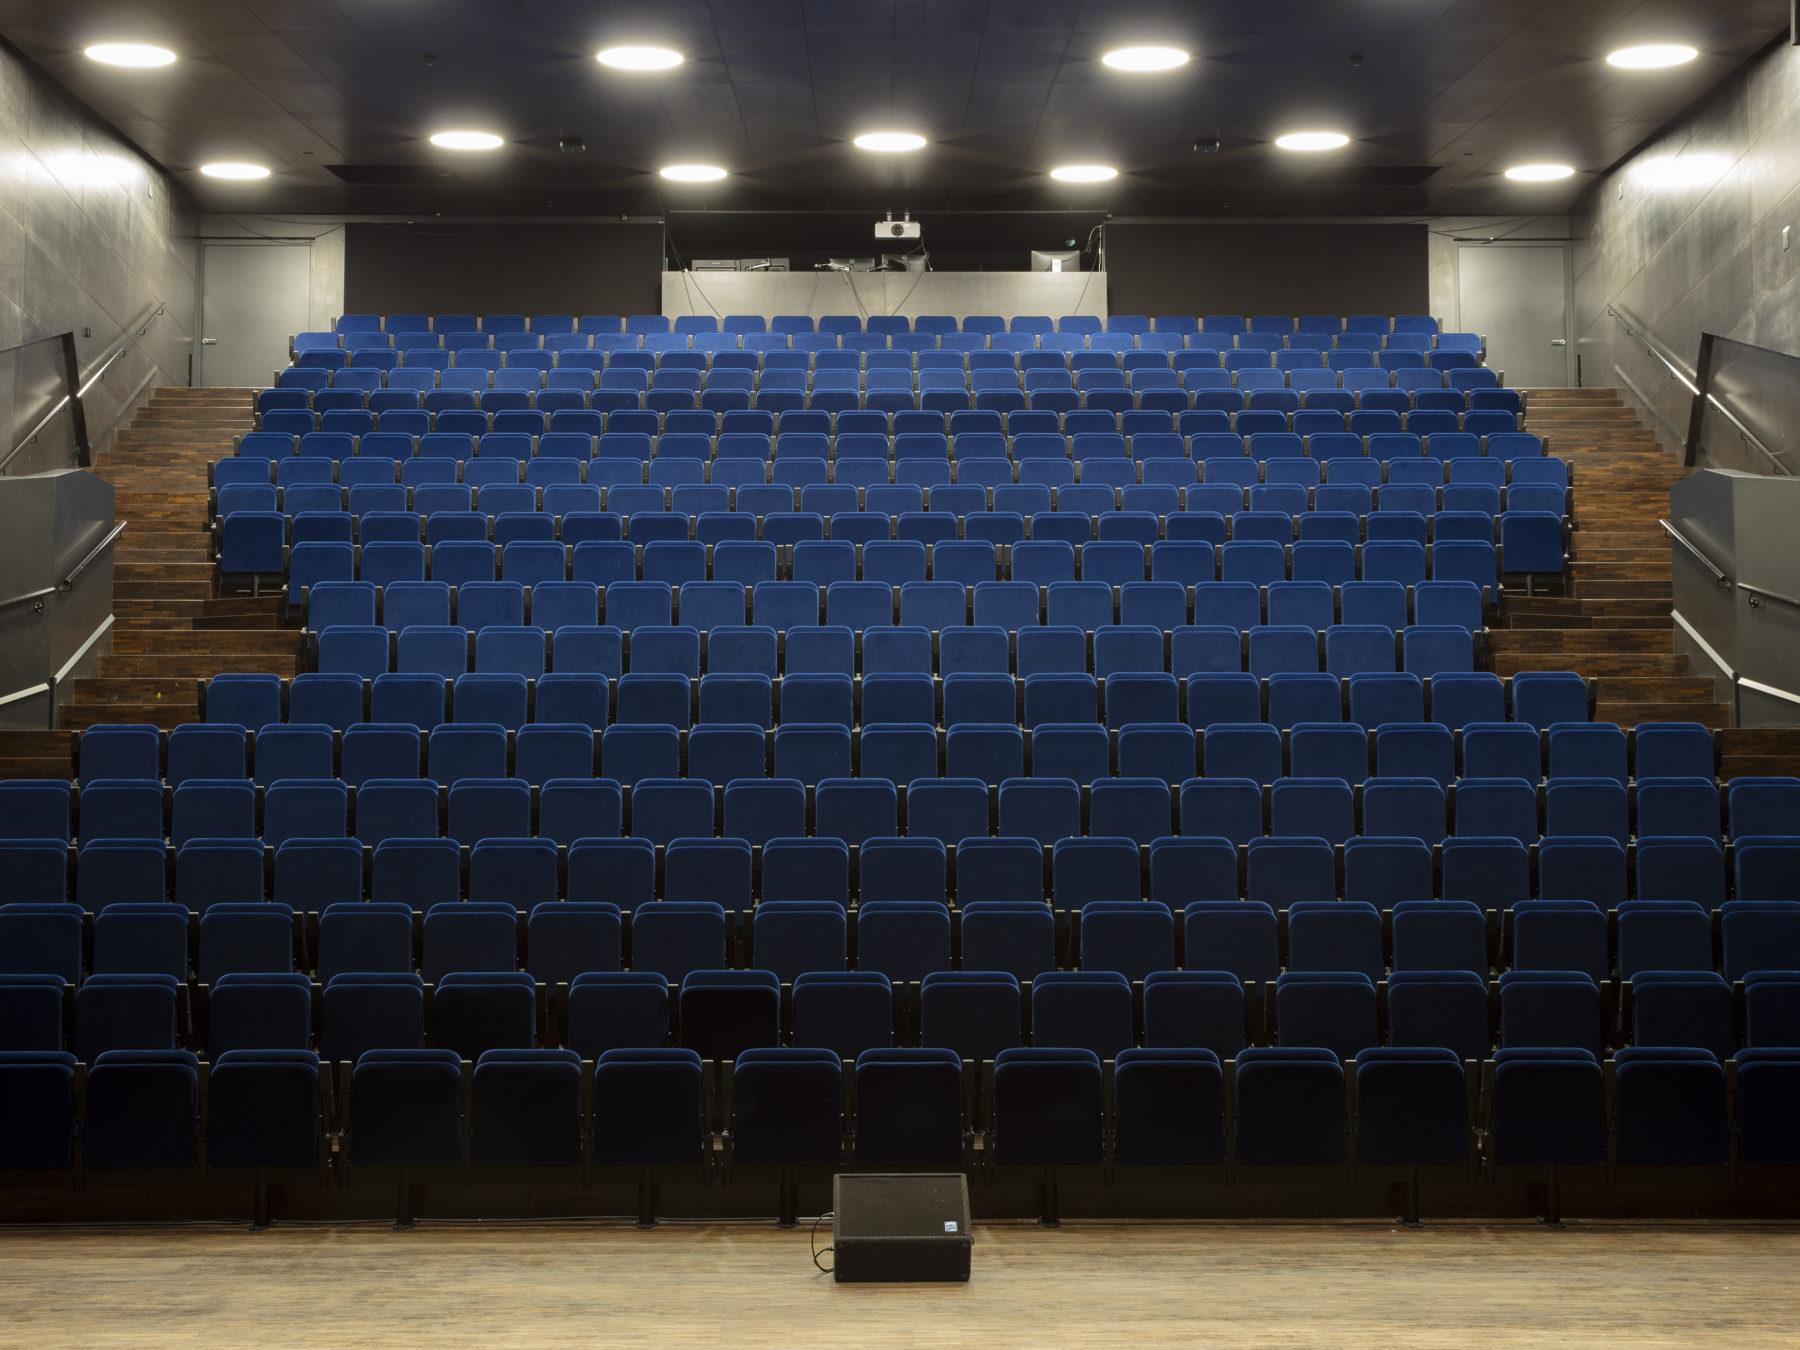 Auditorium of the International School of Lausanne